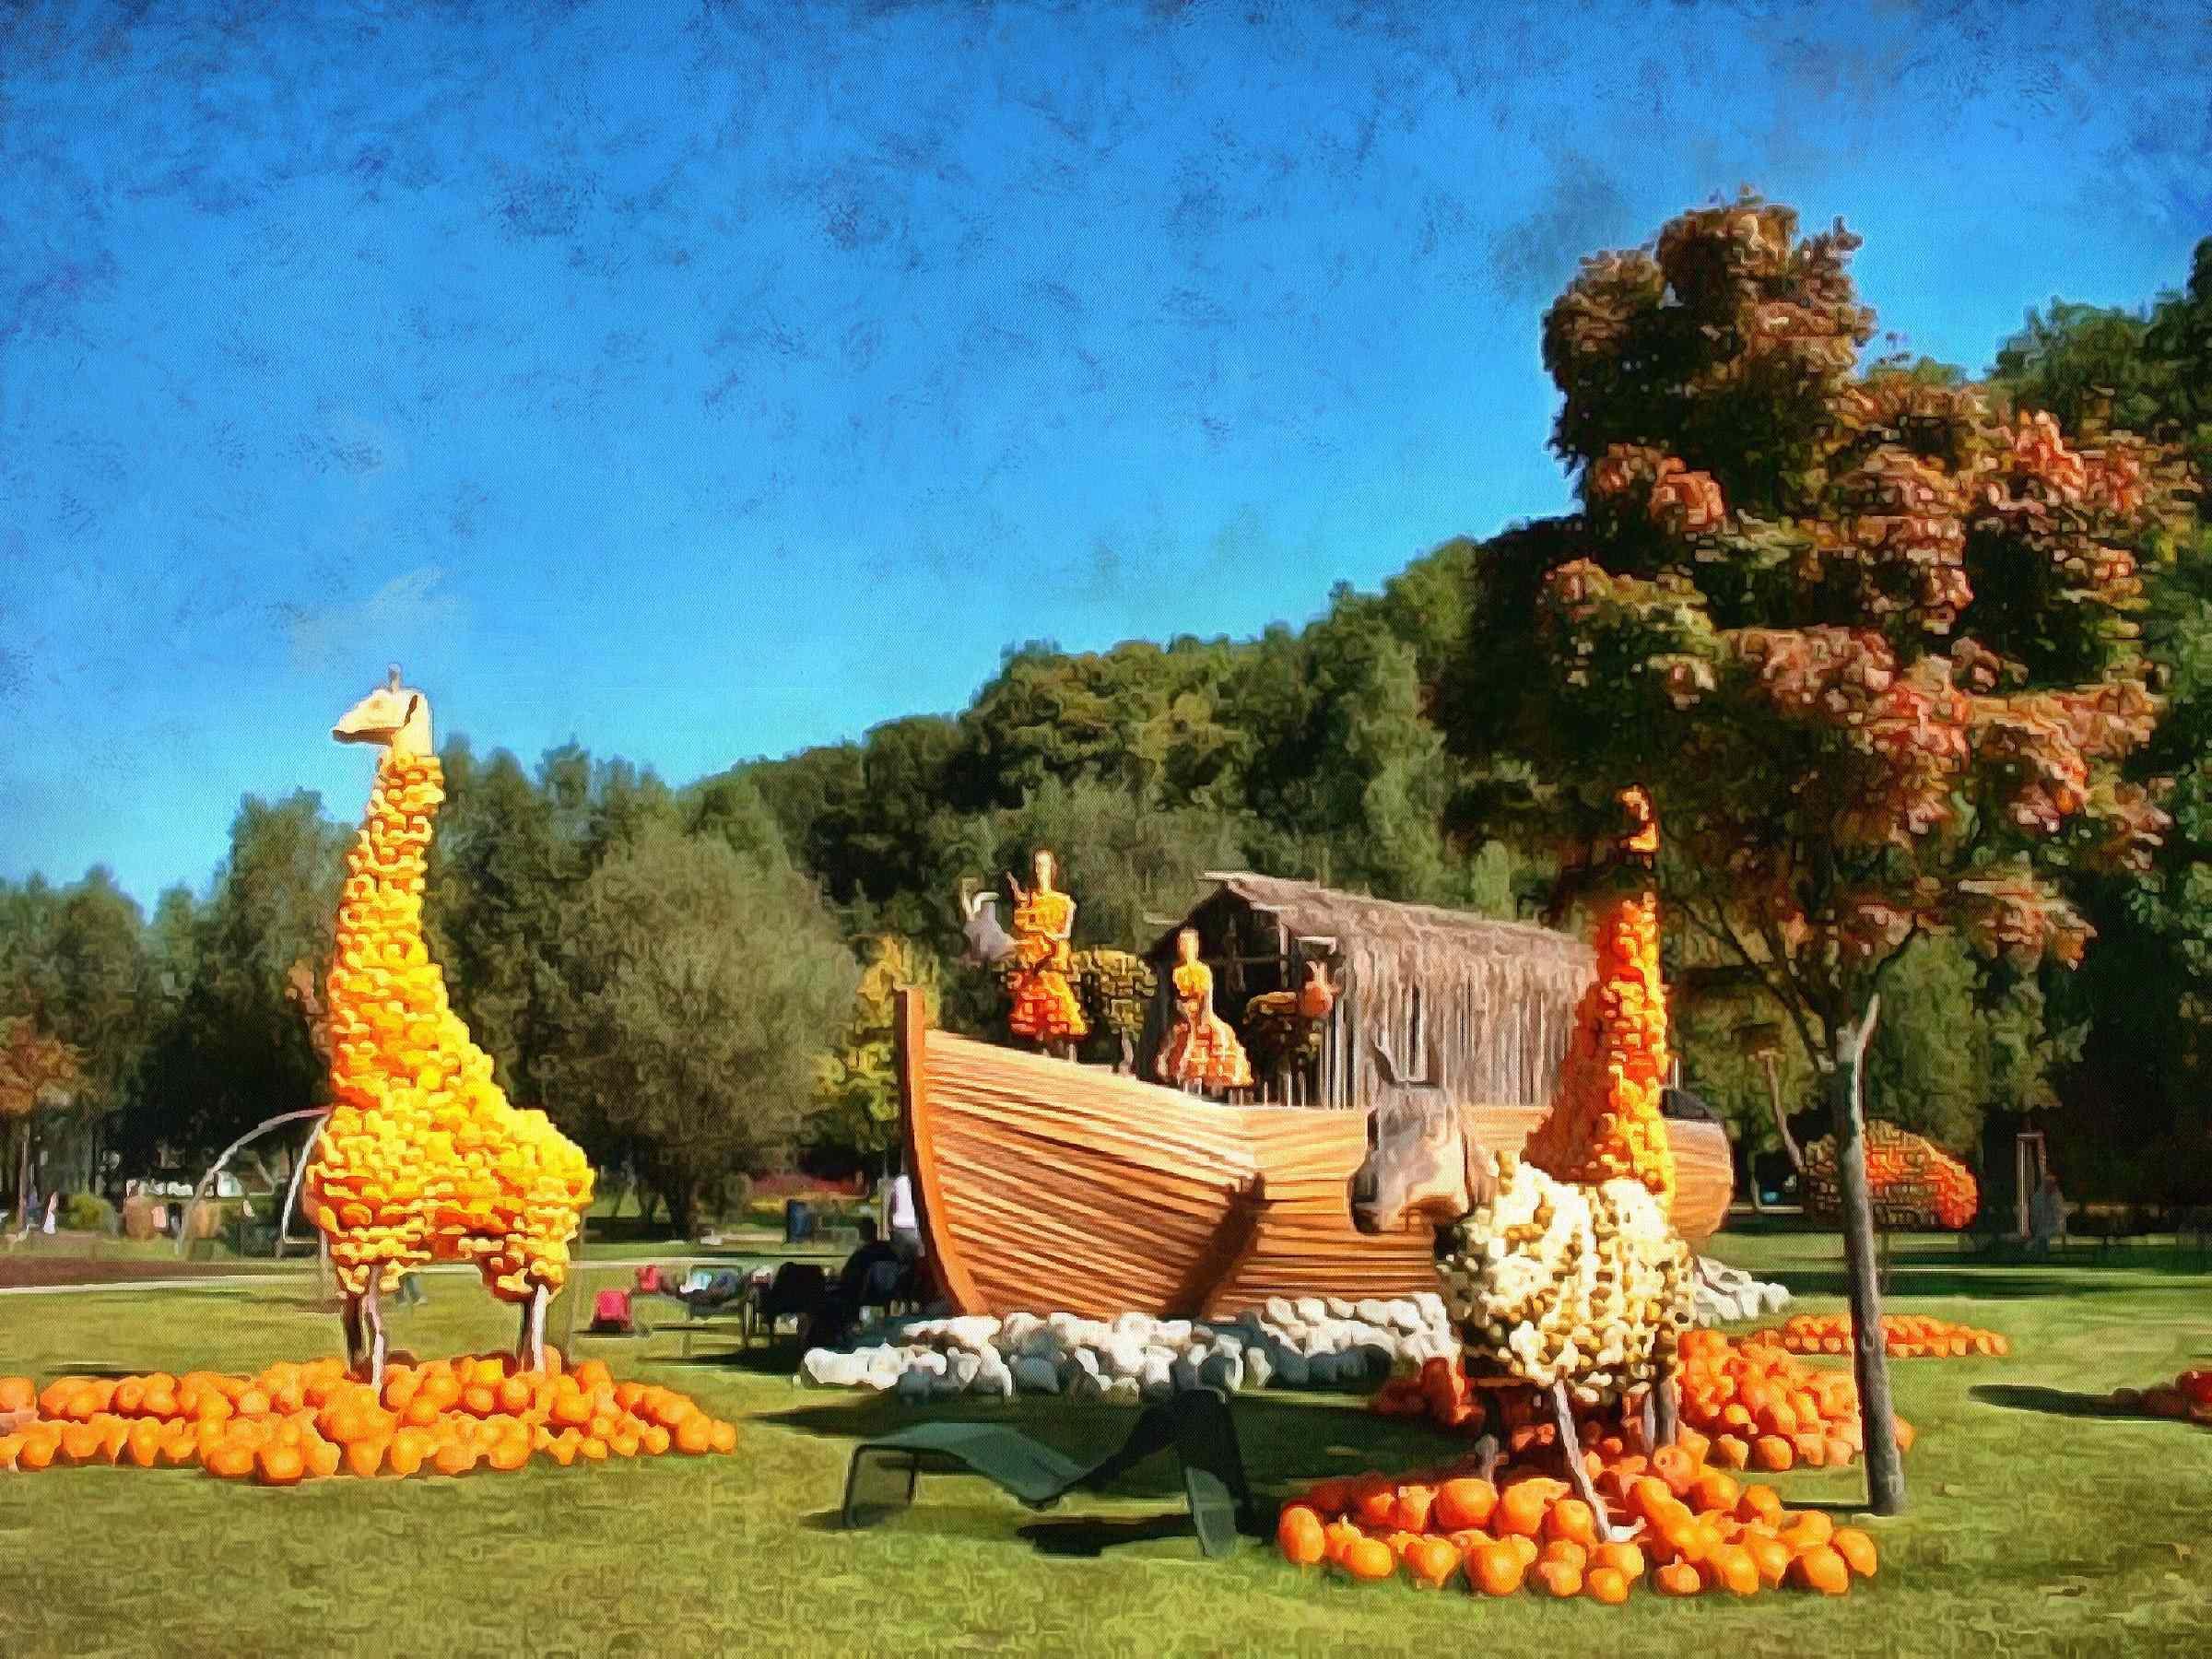 <br>Field pumpkins, harvest a lot of pumpkins,